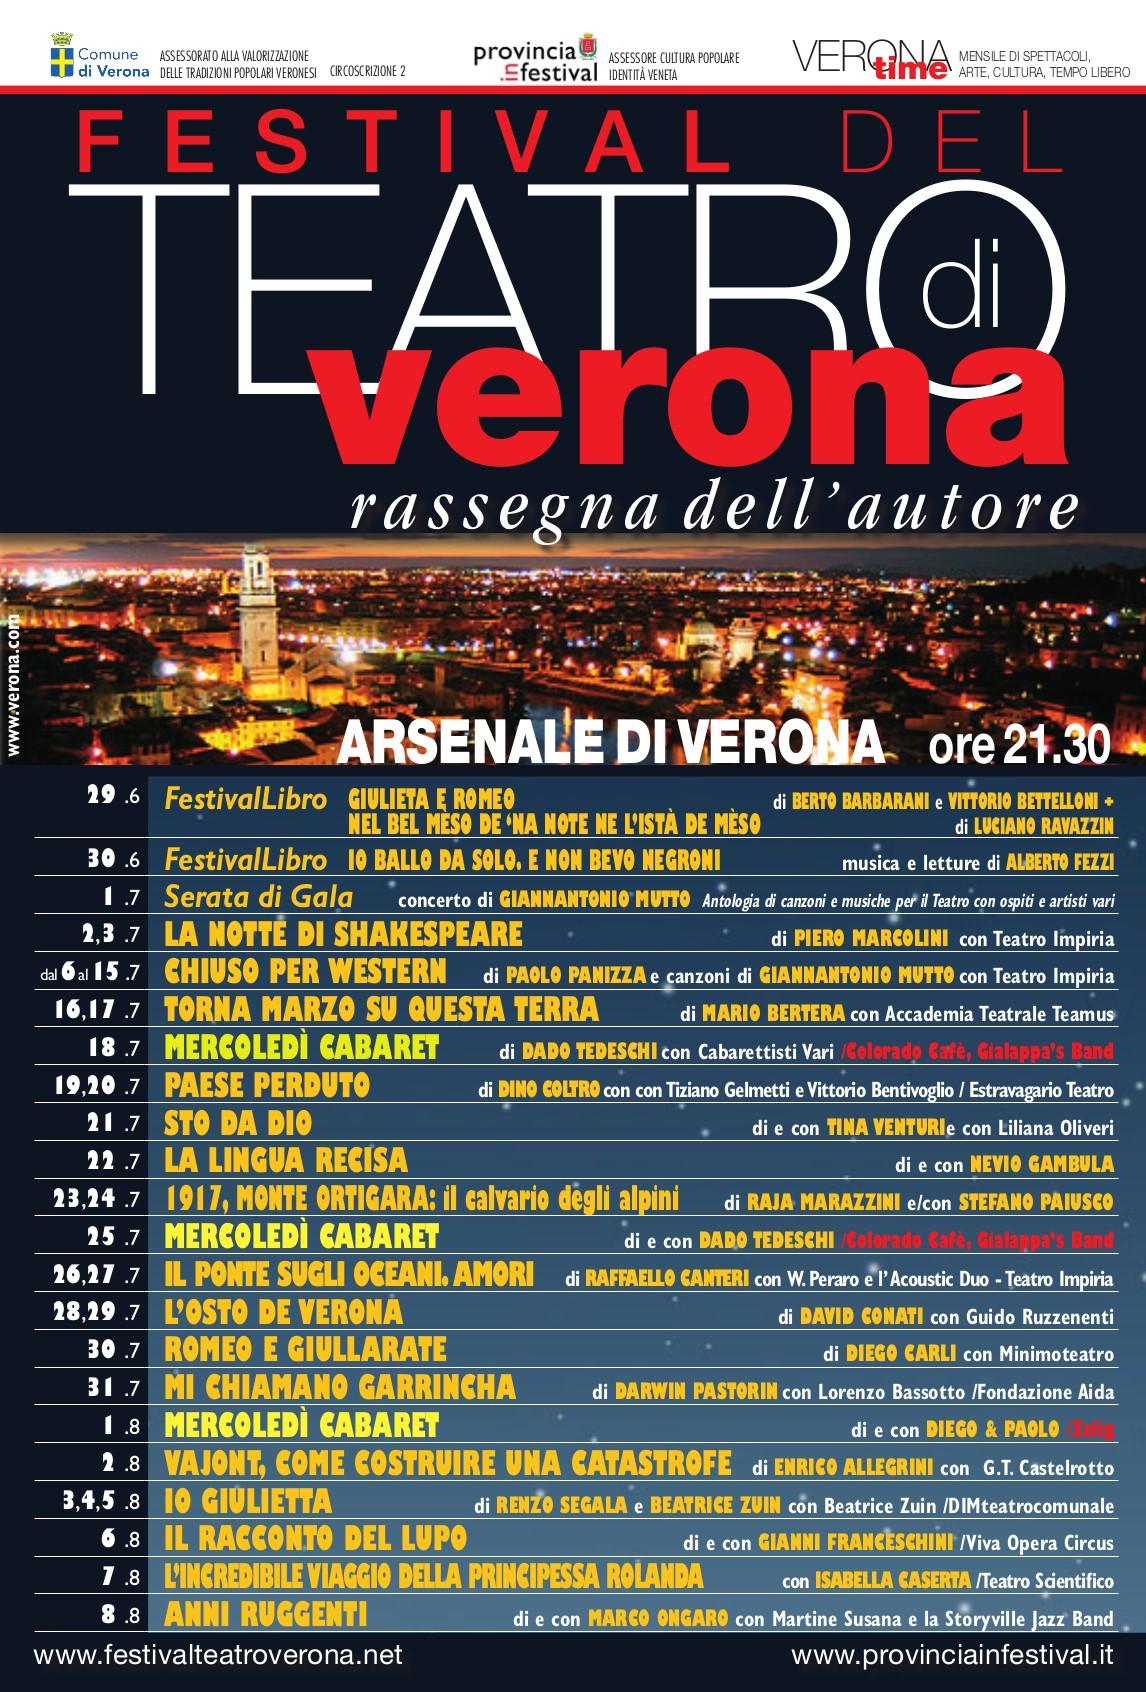 verona-arsenale-teatro-impiria-castelletti